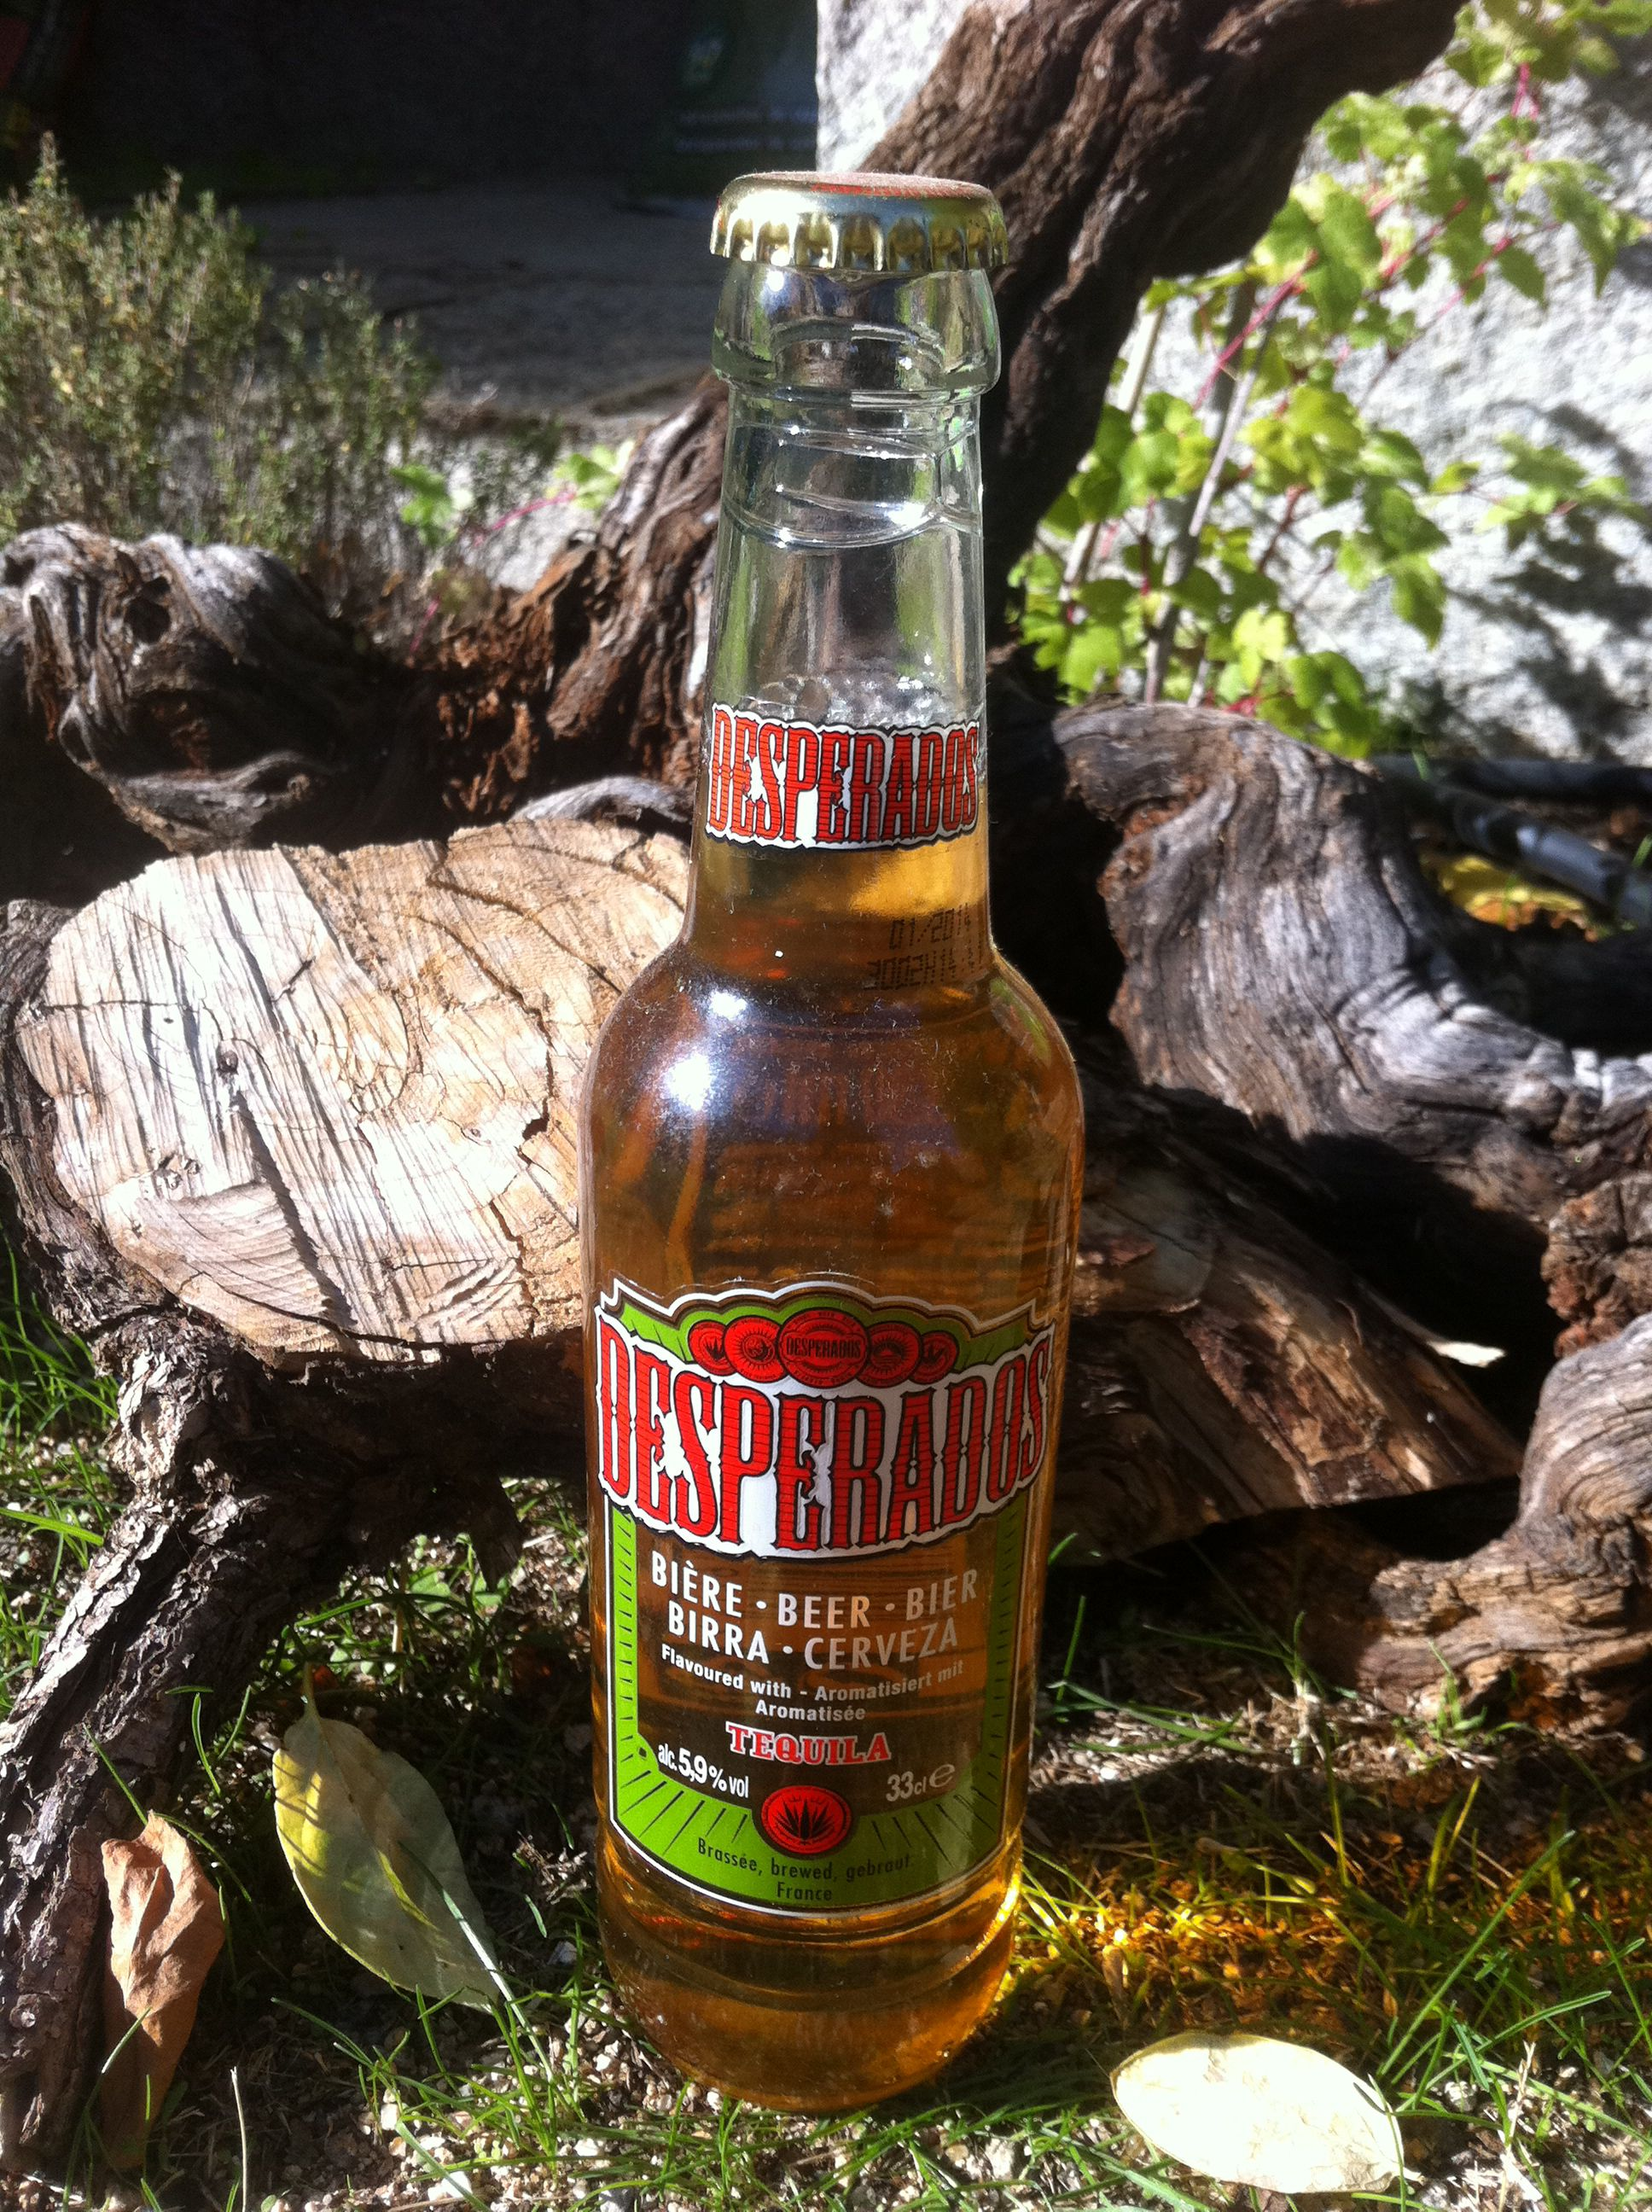 Desperados Cerveza Con Tequila Beer Tequila Beer Bottle